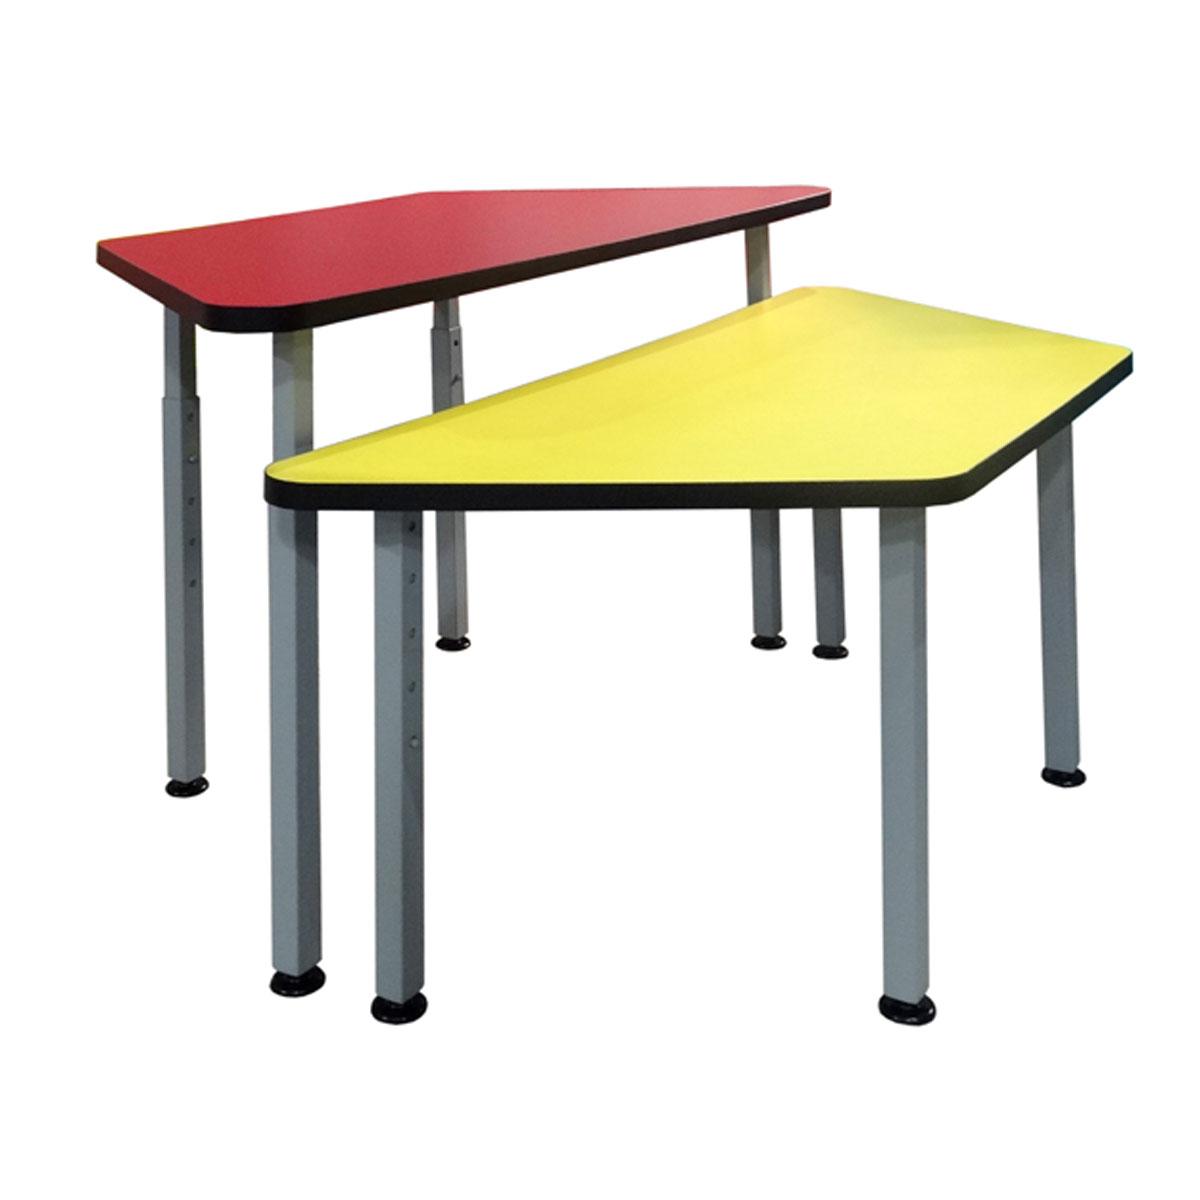 Muebles Continental L Nea Estudiantil Mesas Escolares # Muebles Pupitres Escolares